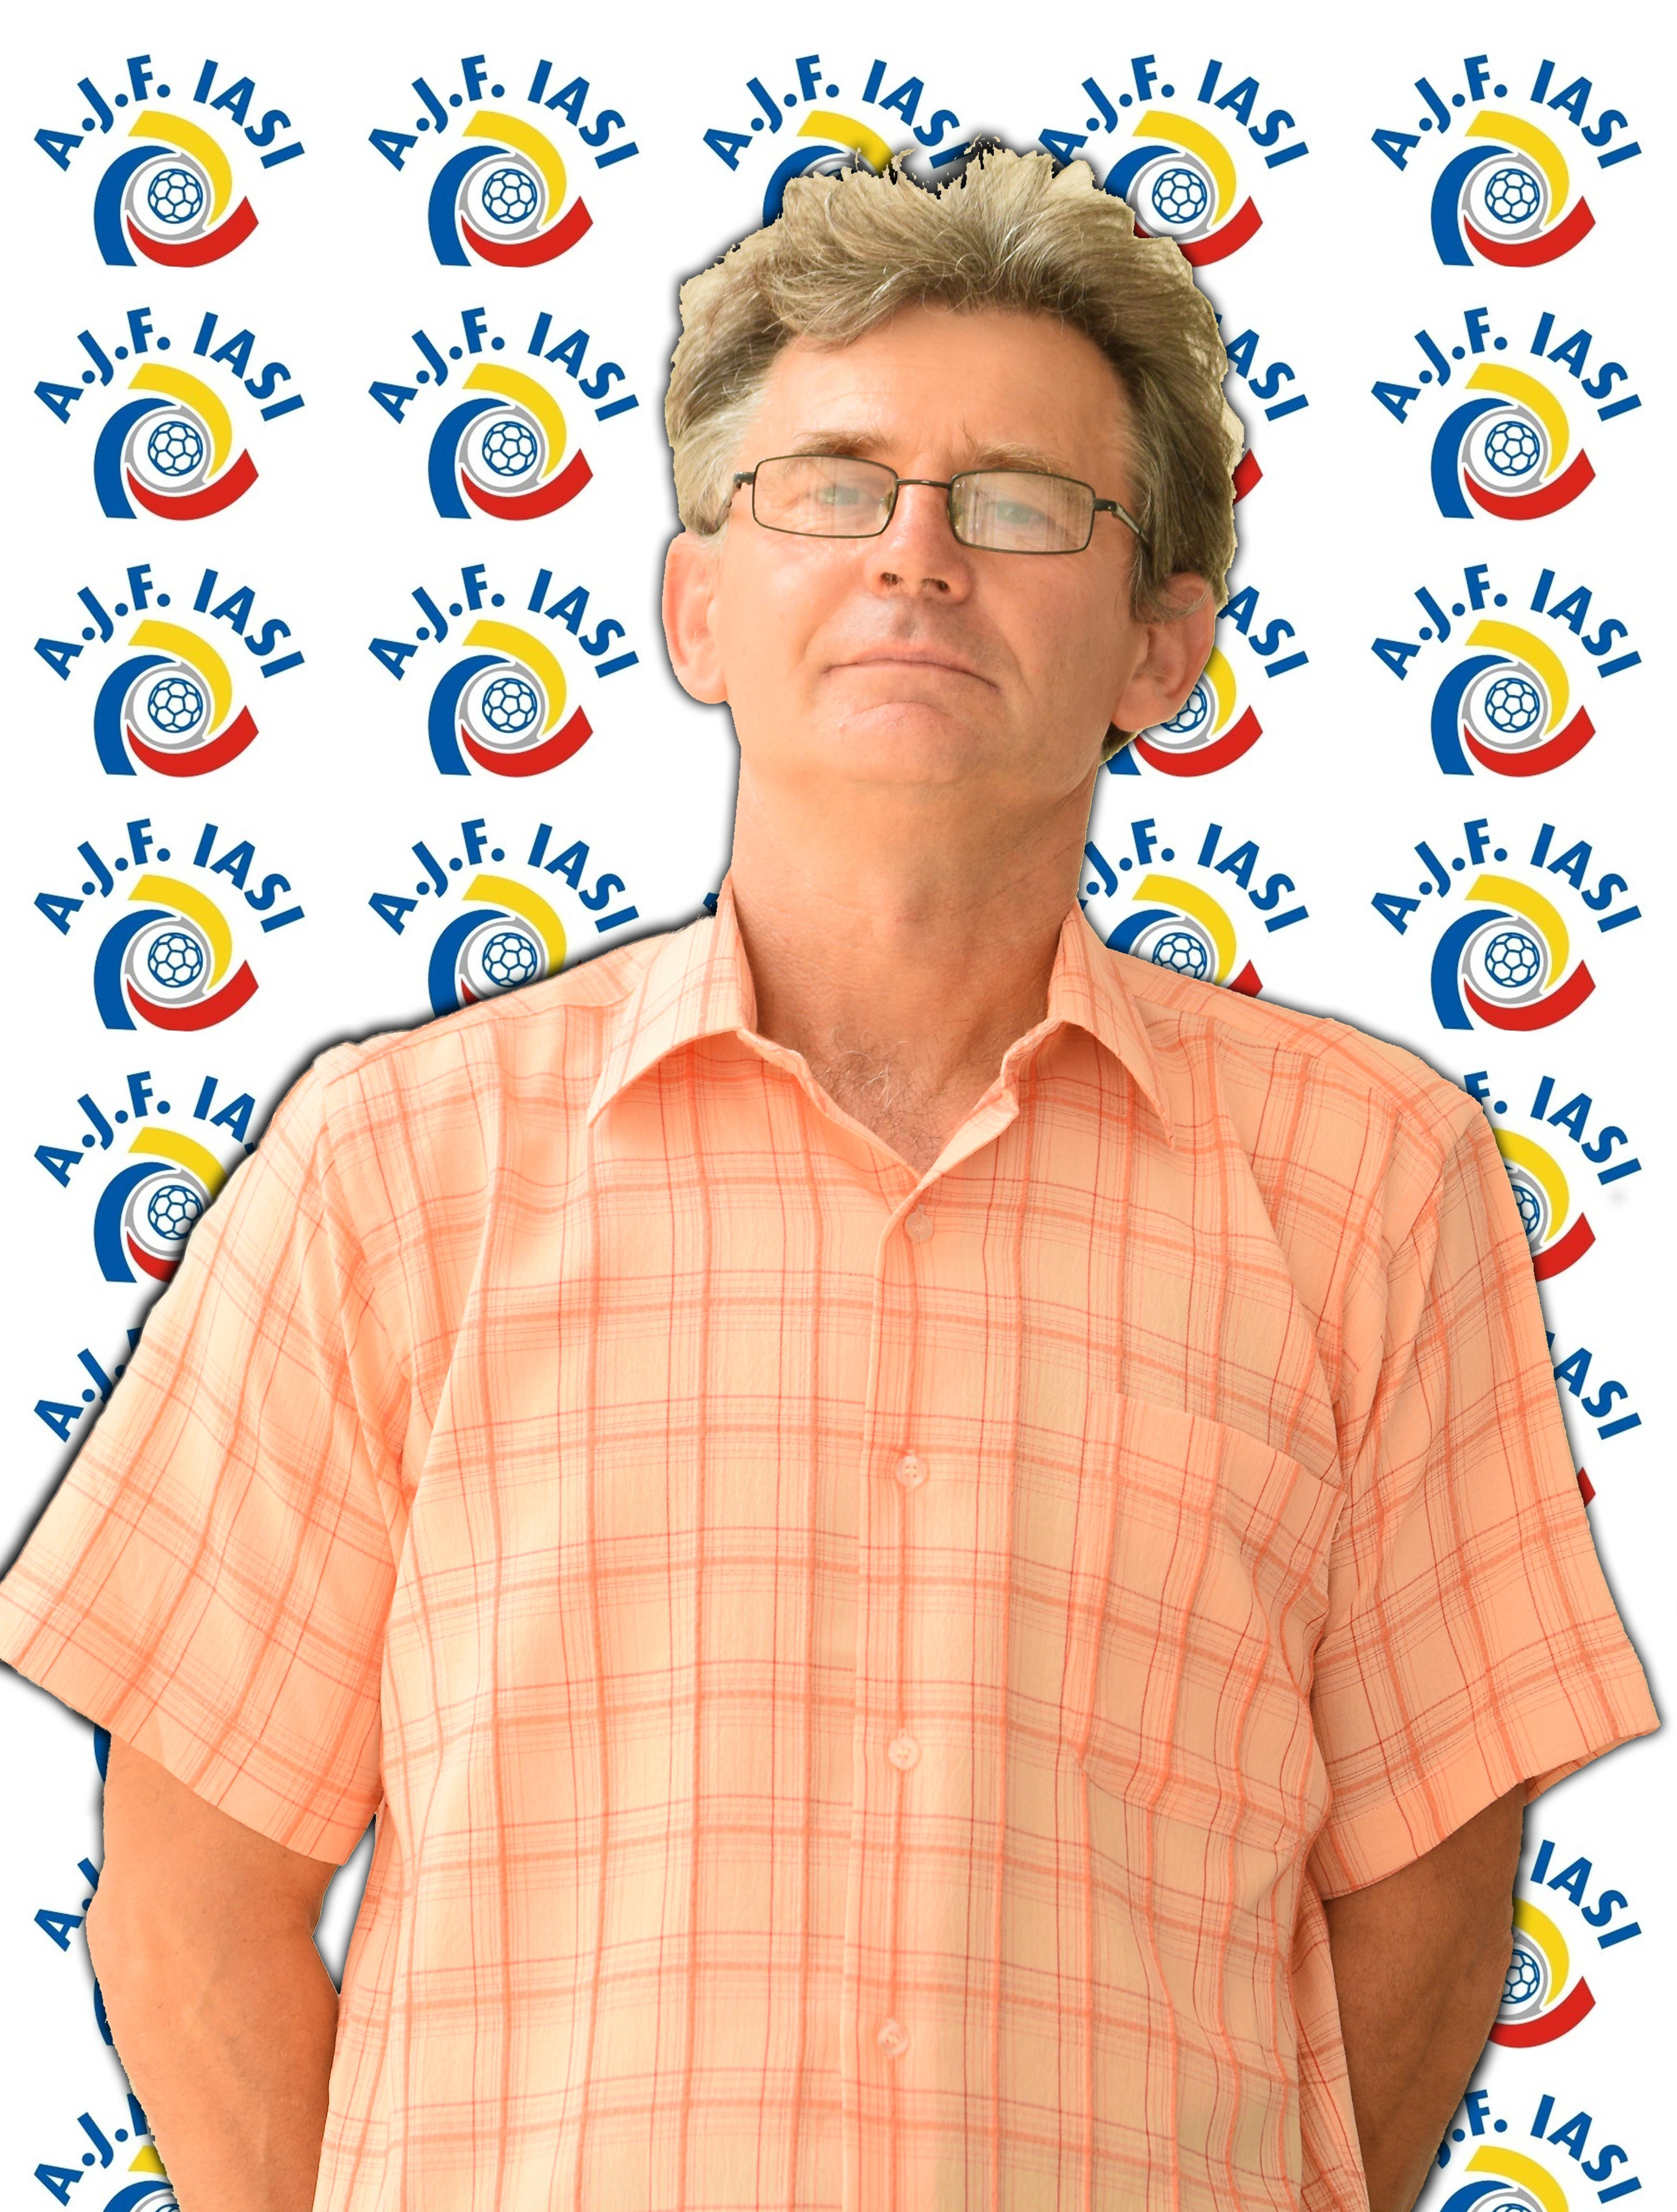 Mihalcut Laurentiu